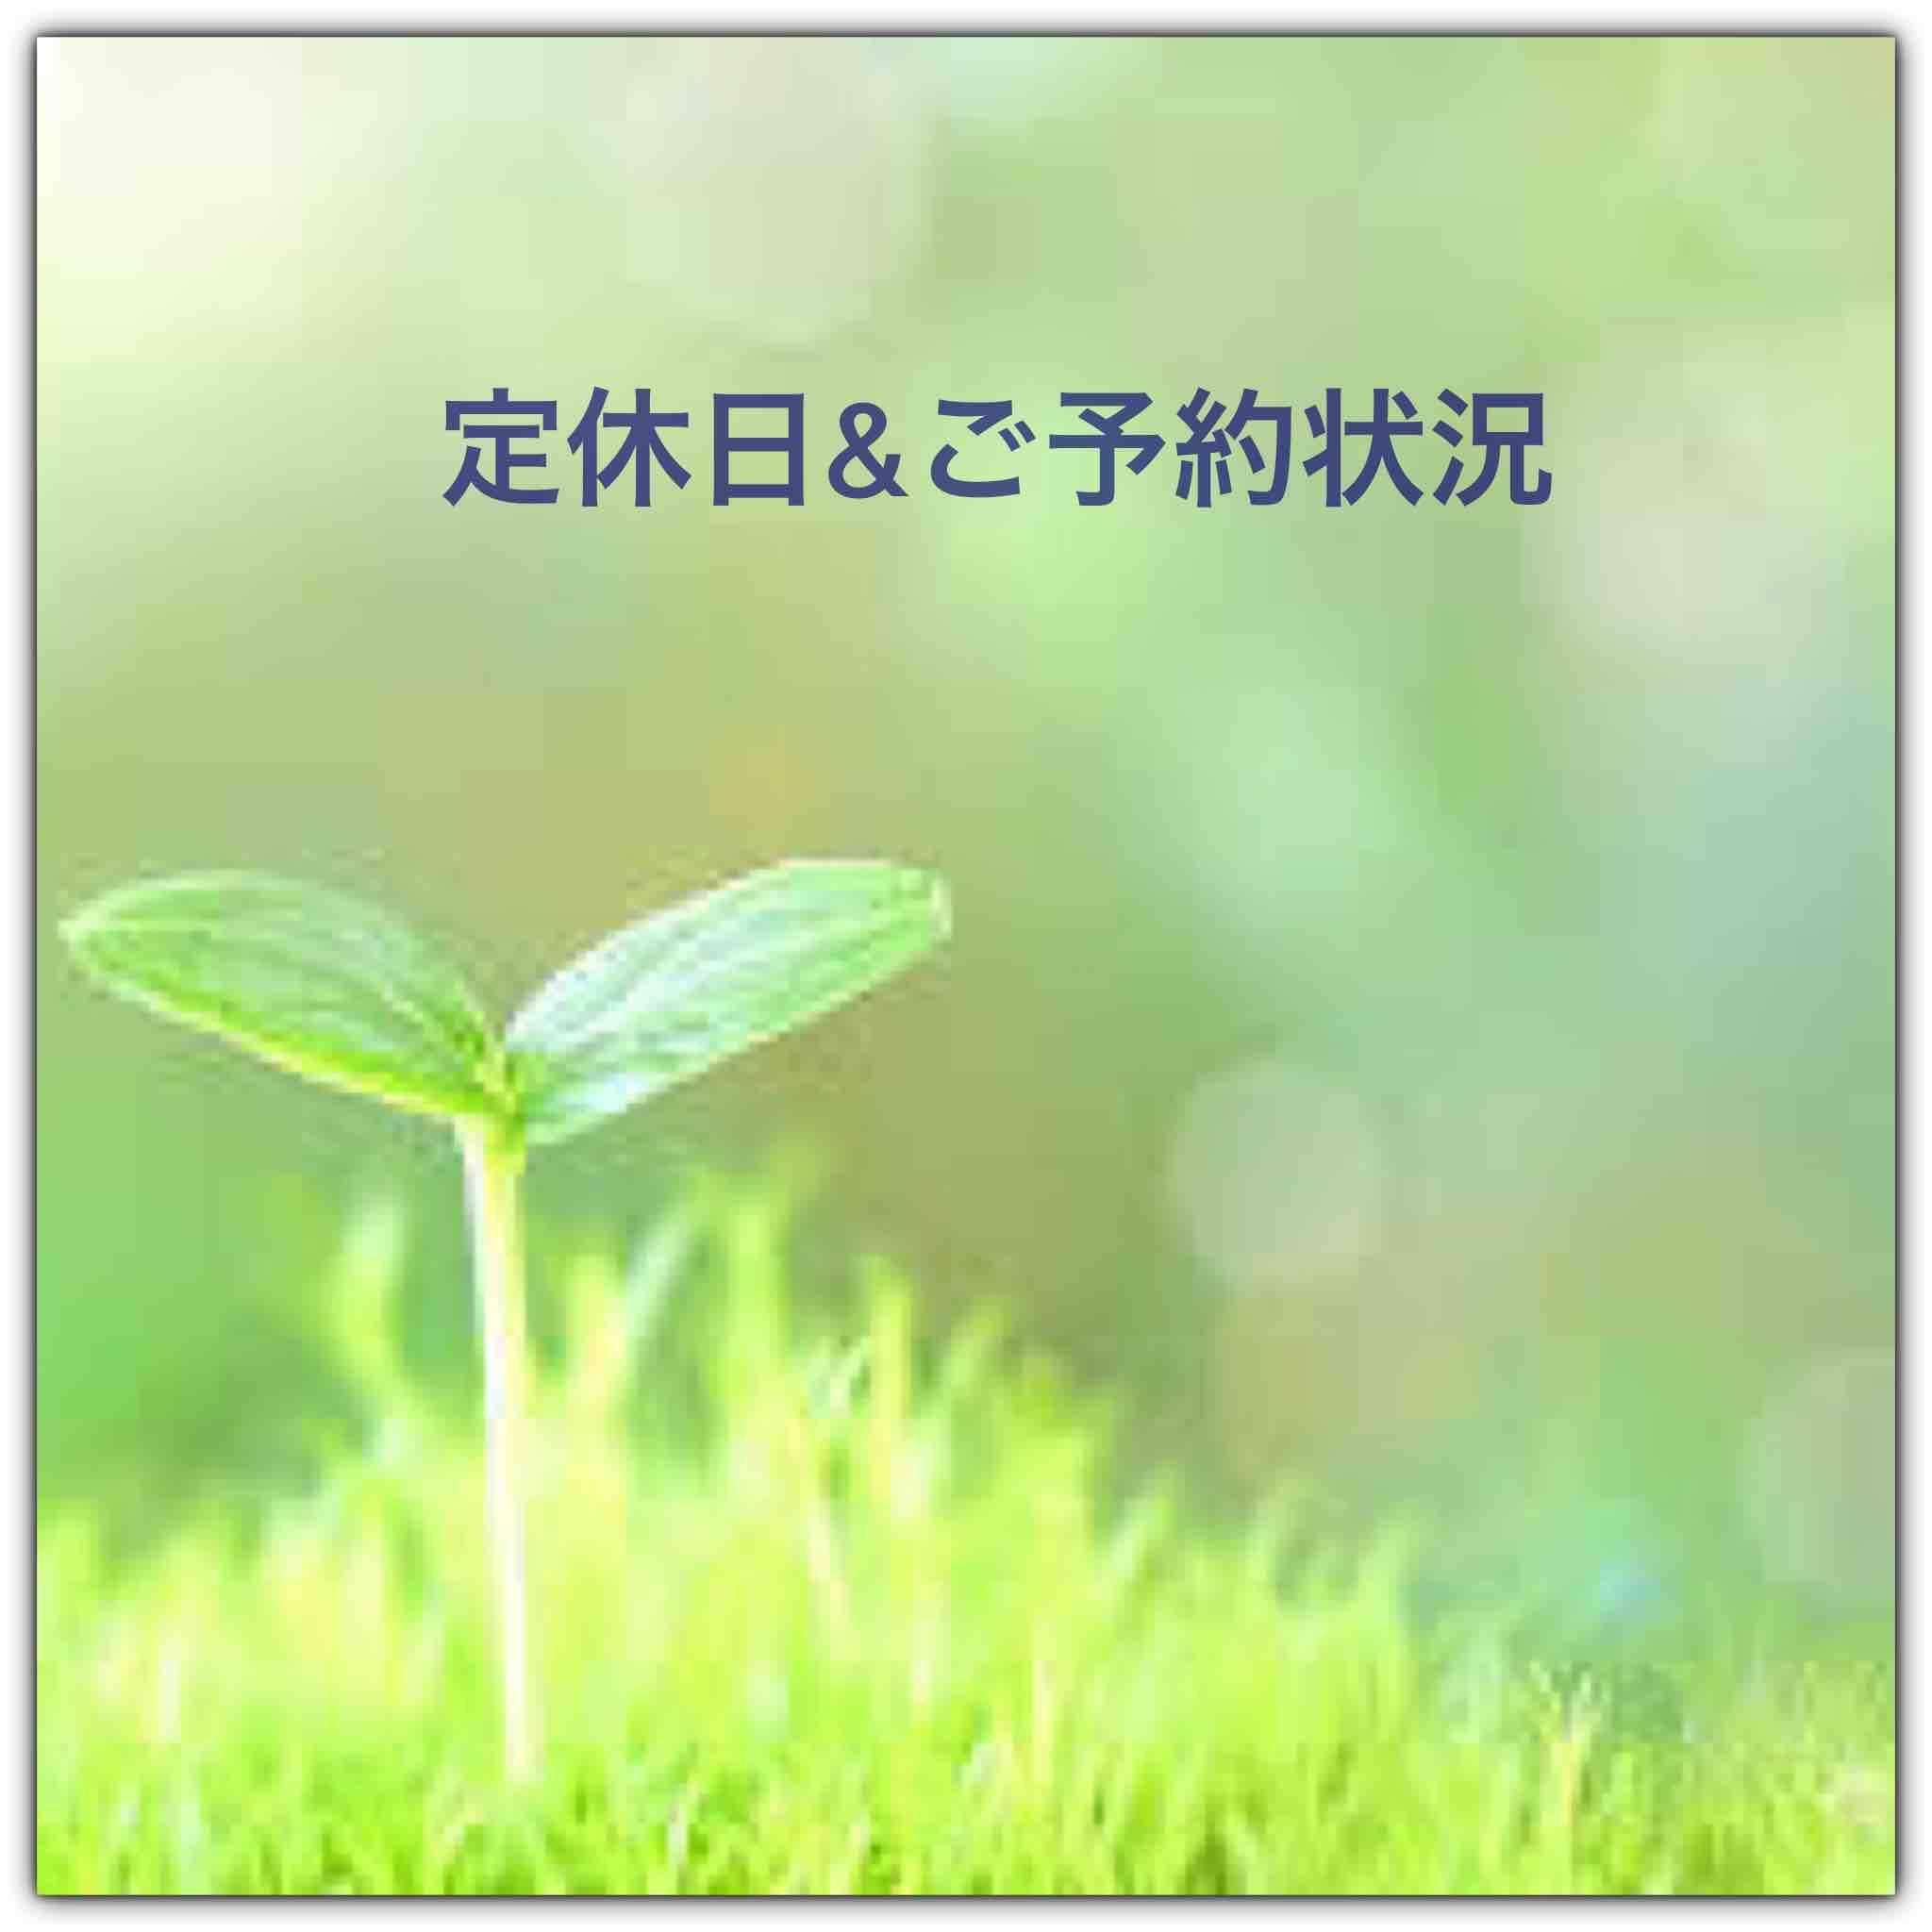 fc2blog_201901201657219bf.jpg